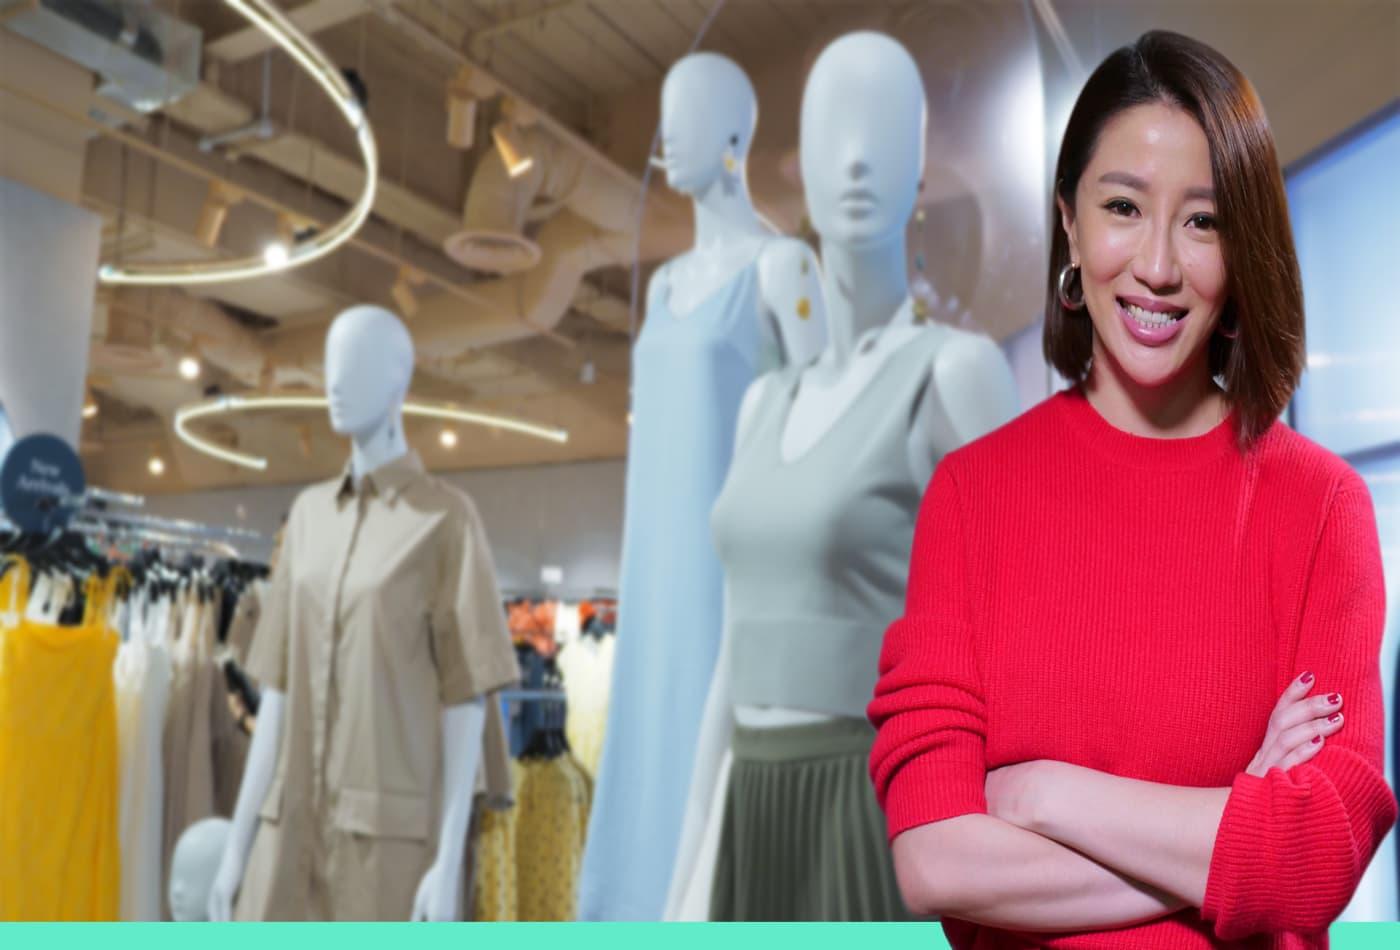 She borrowed her mom's life savings and built a multimillion-dollar fashion empire